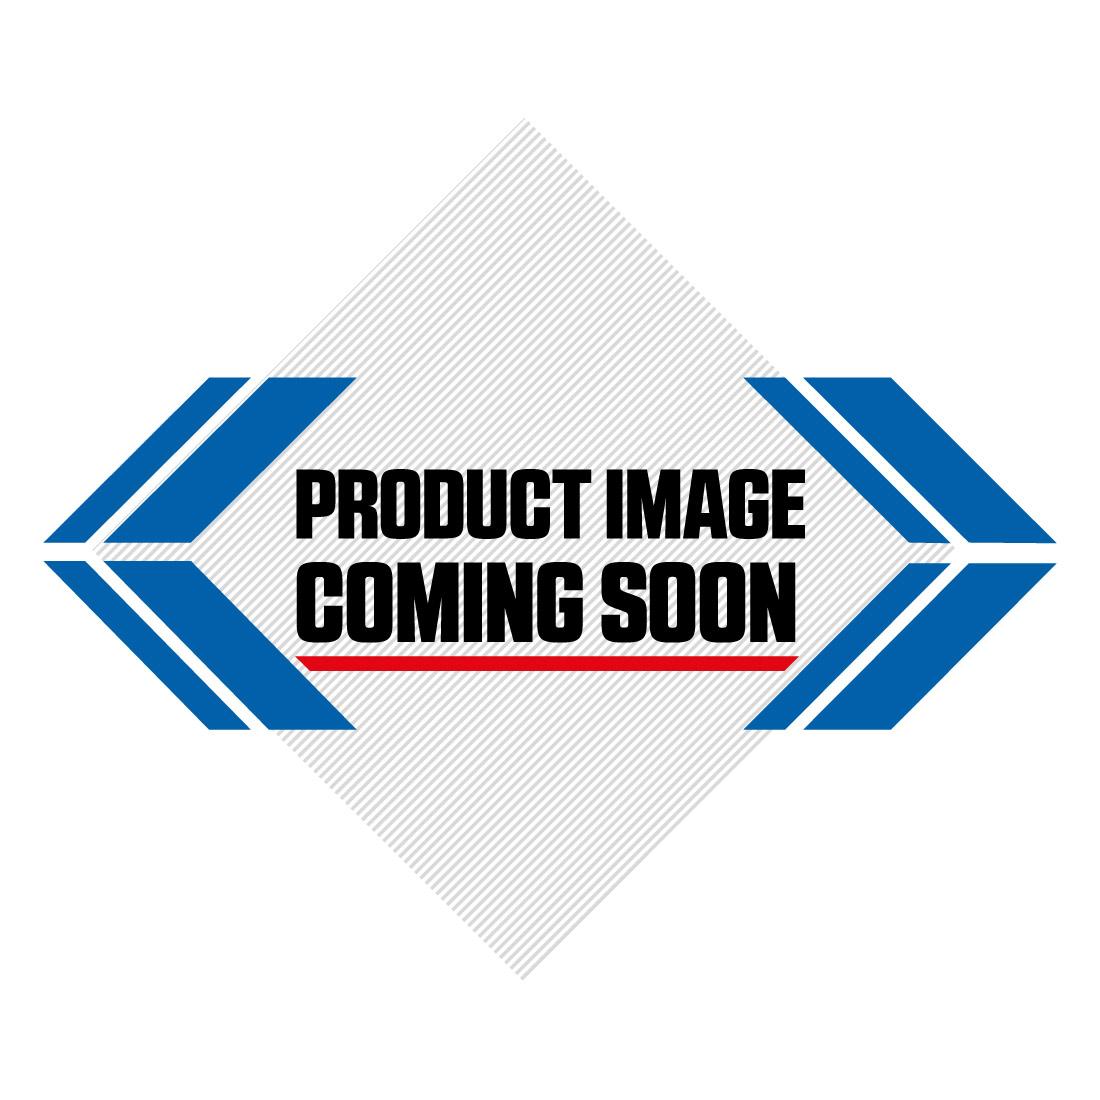 Suzuki Plastic Kit RMZ 450 (08-17) Black Image-3>